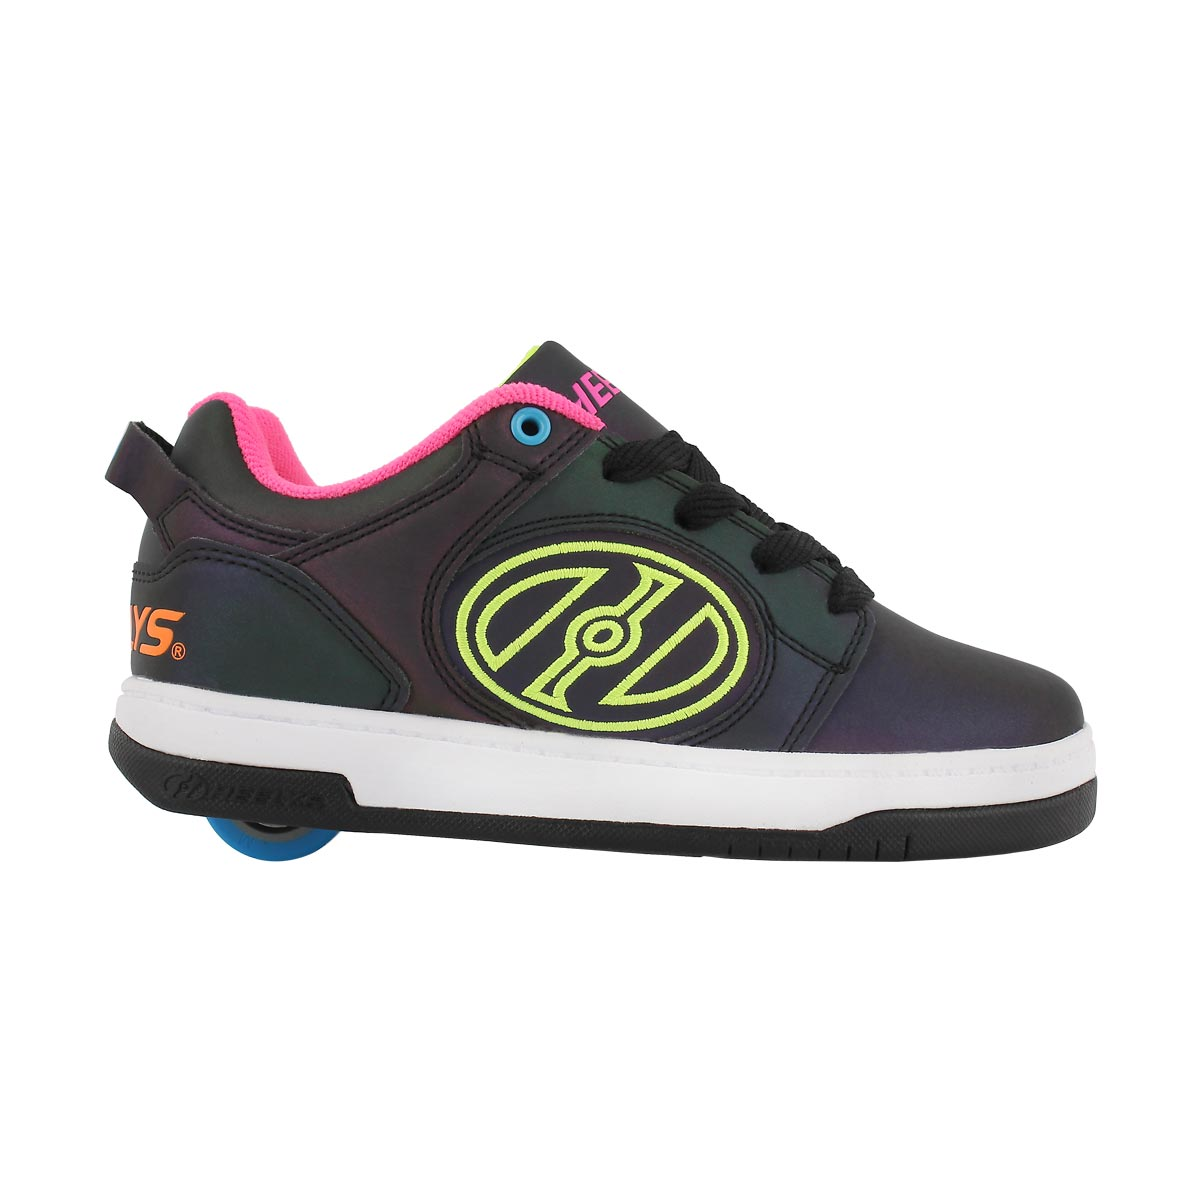 Grls Voyager blk/ylw/pnk skate sneaker